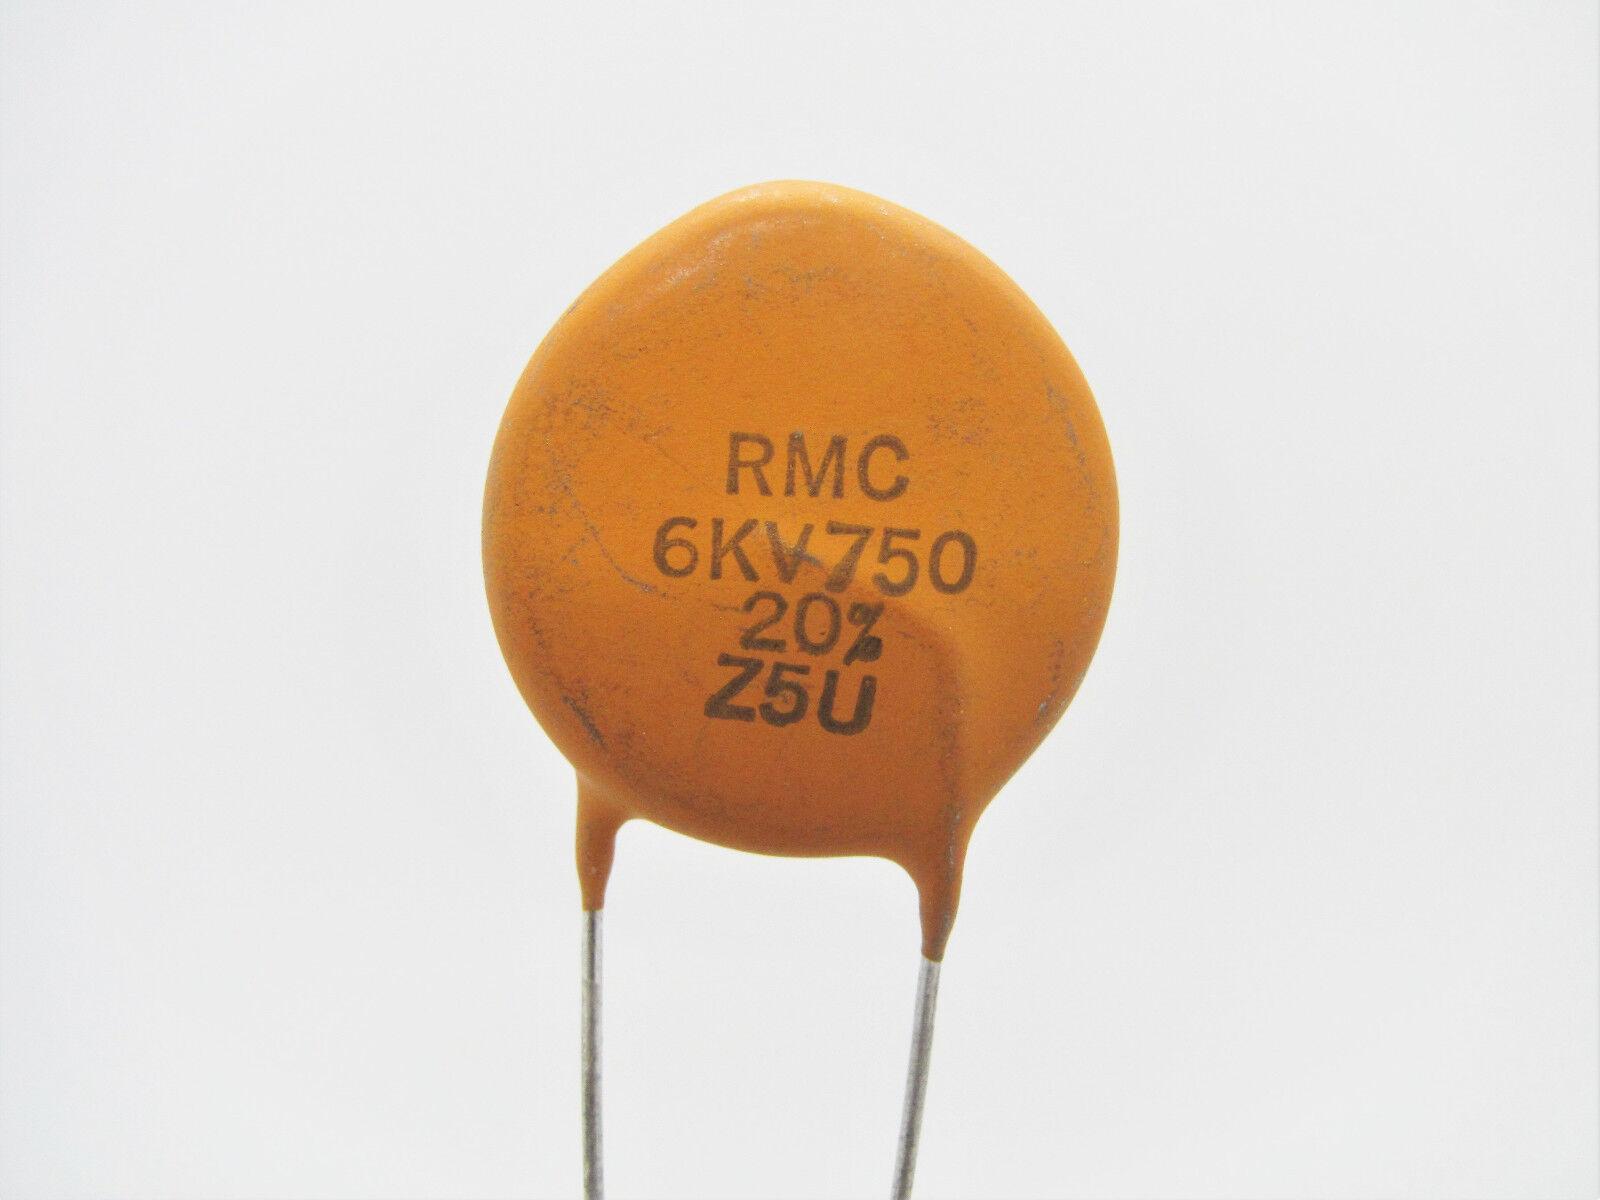 Lot of 25 S3N Ceramic Disc Capacitors 100pF 1000V NOS